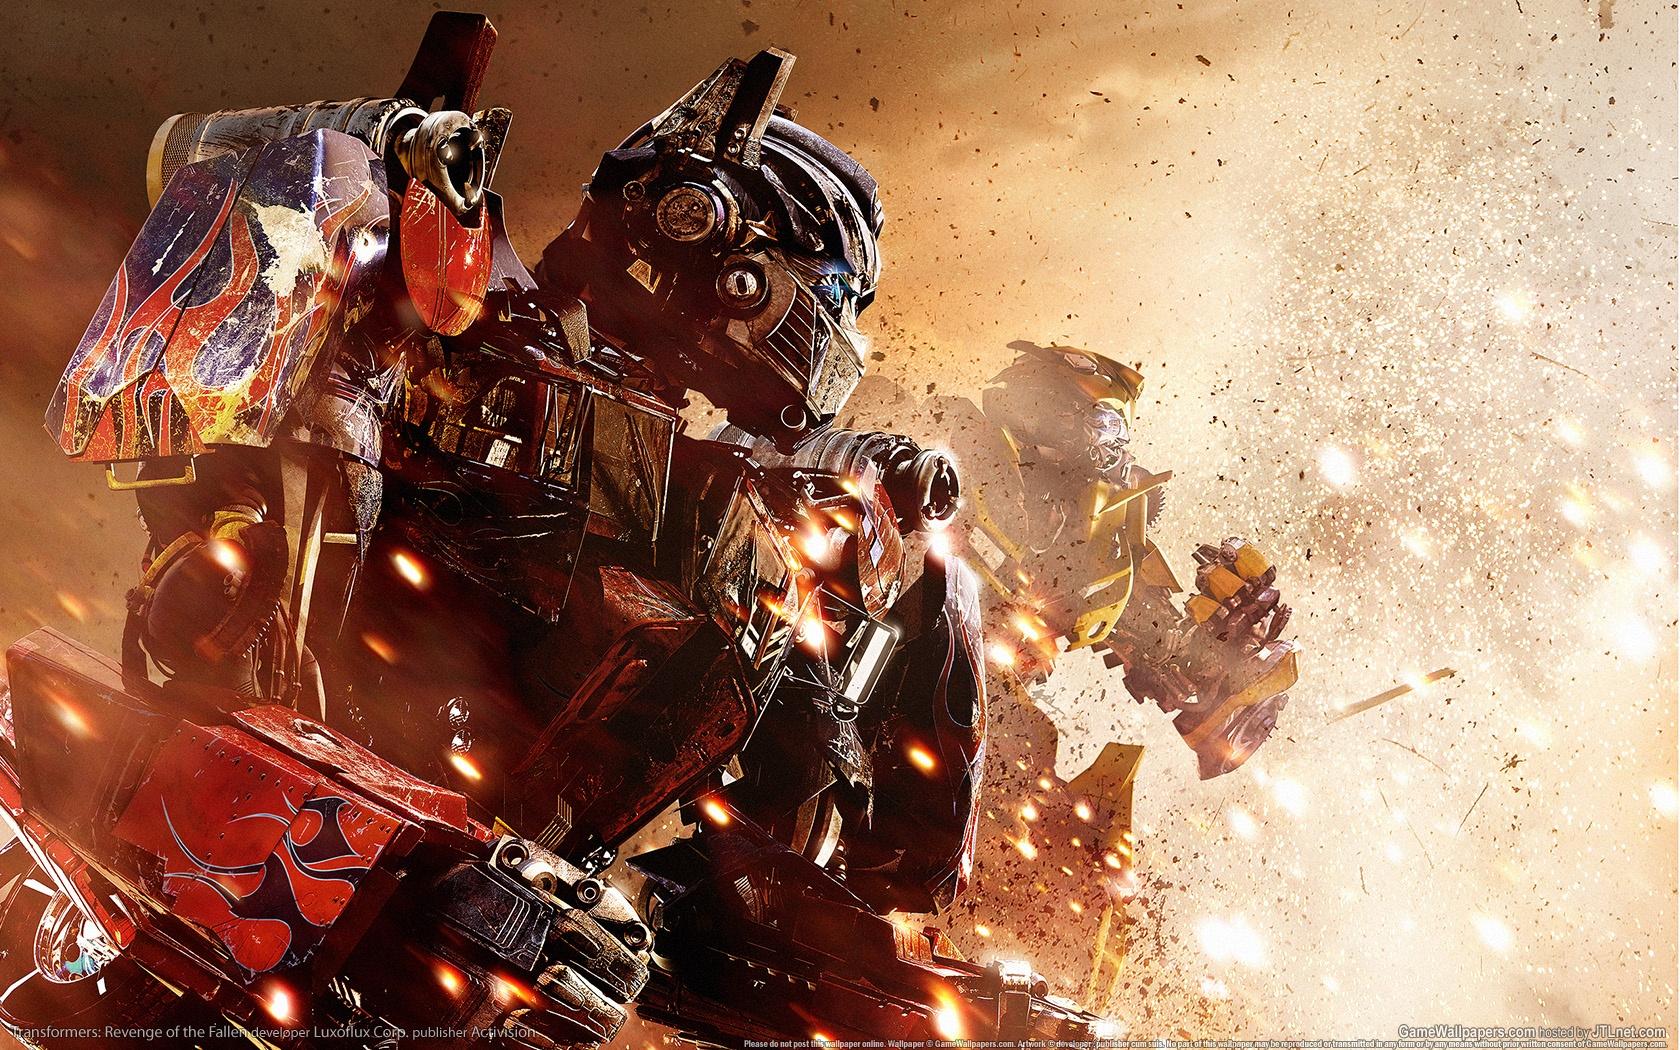 Photo of Wallpaper do dia: Transformers!